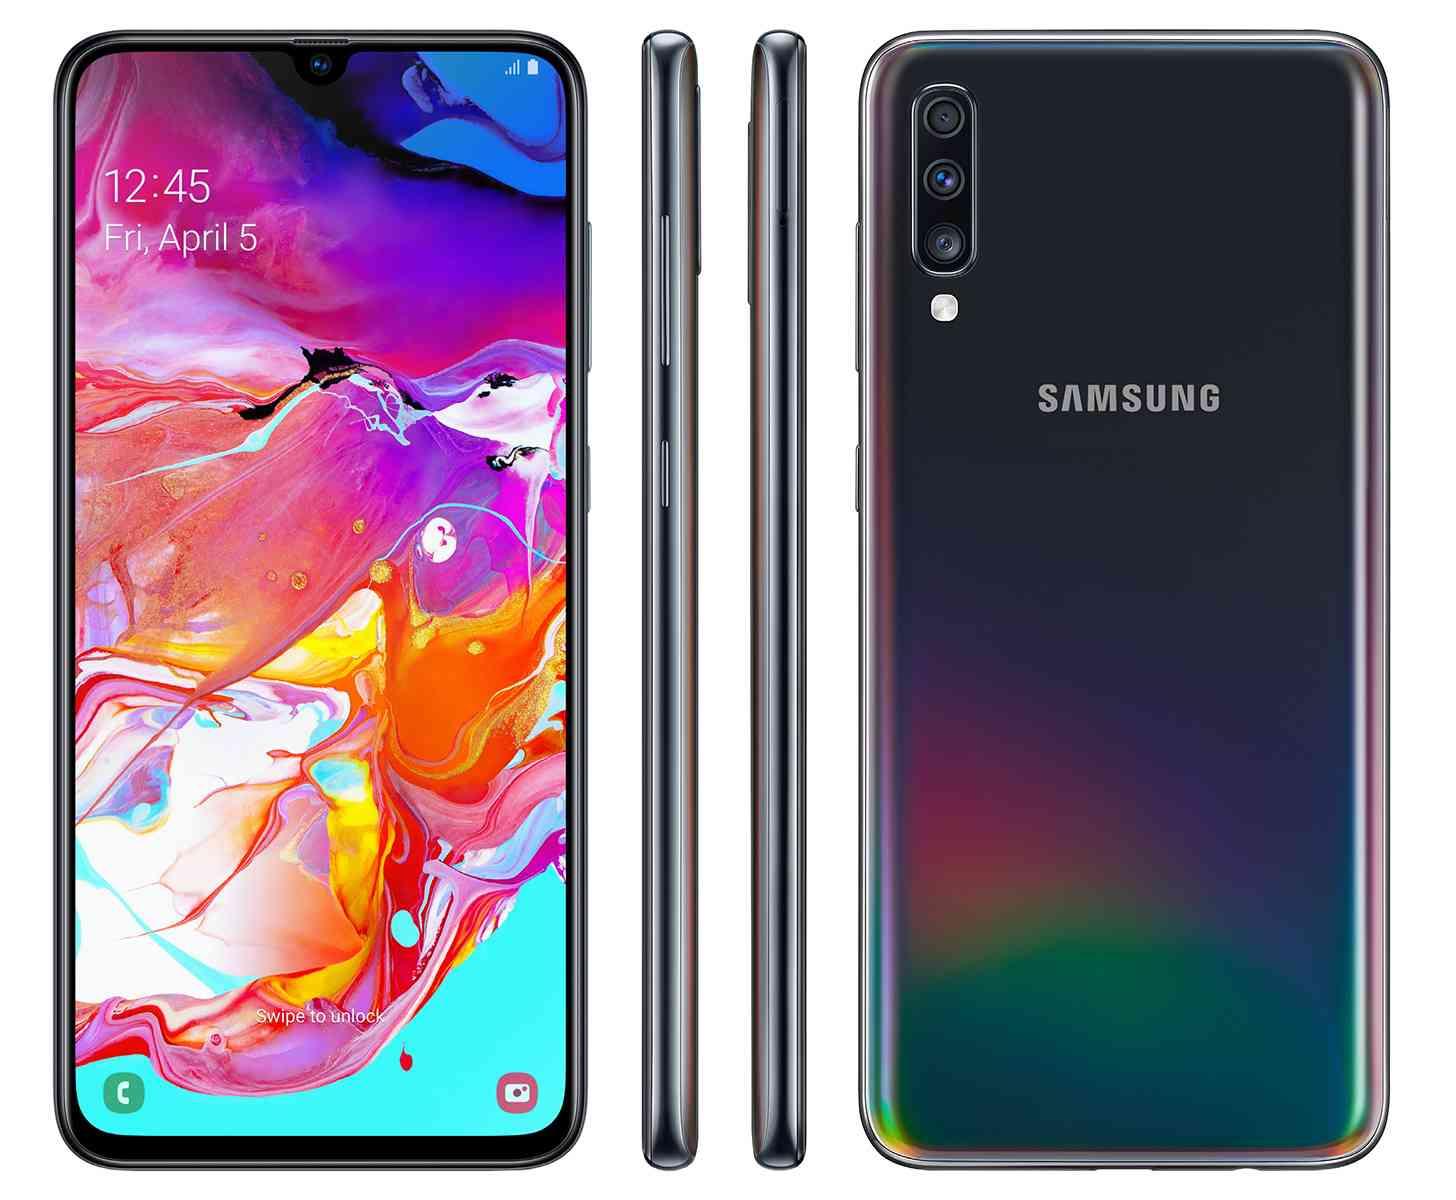 Samsung Galaxy A70 official